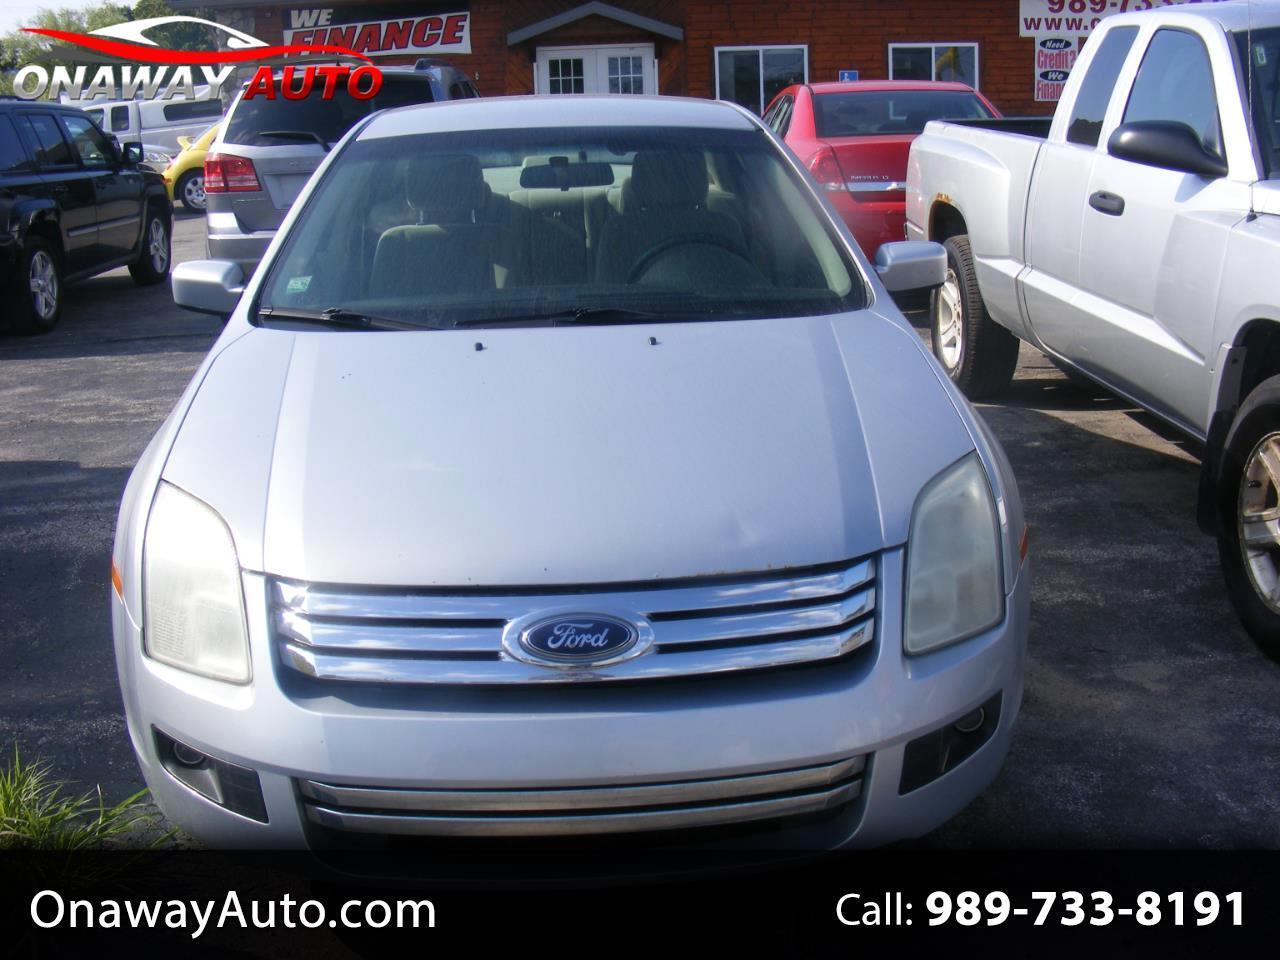 Ford Fusion 4dr Sdn V6 SE 2006